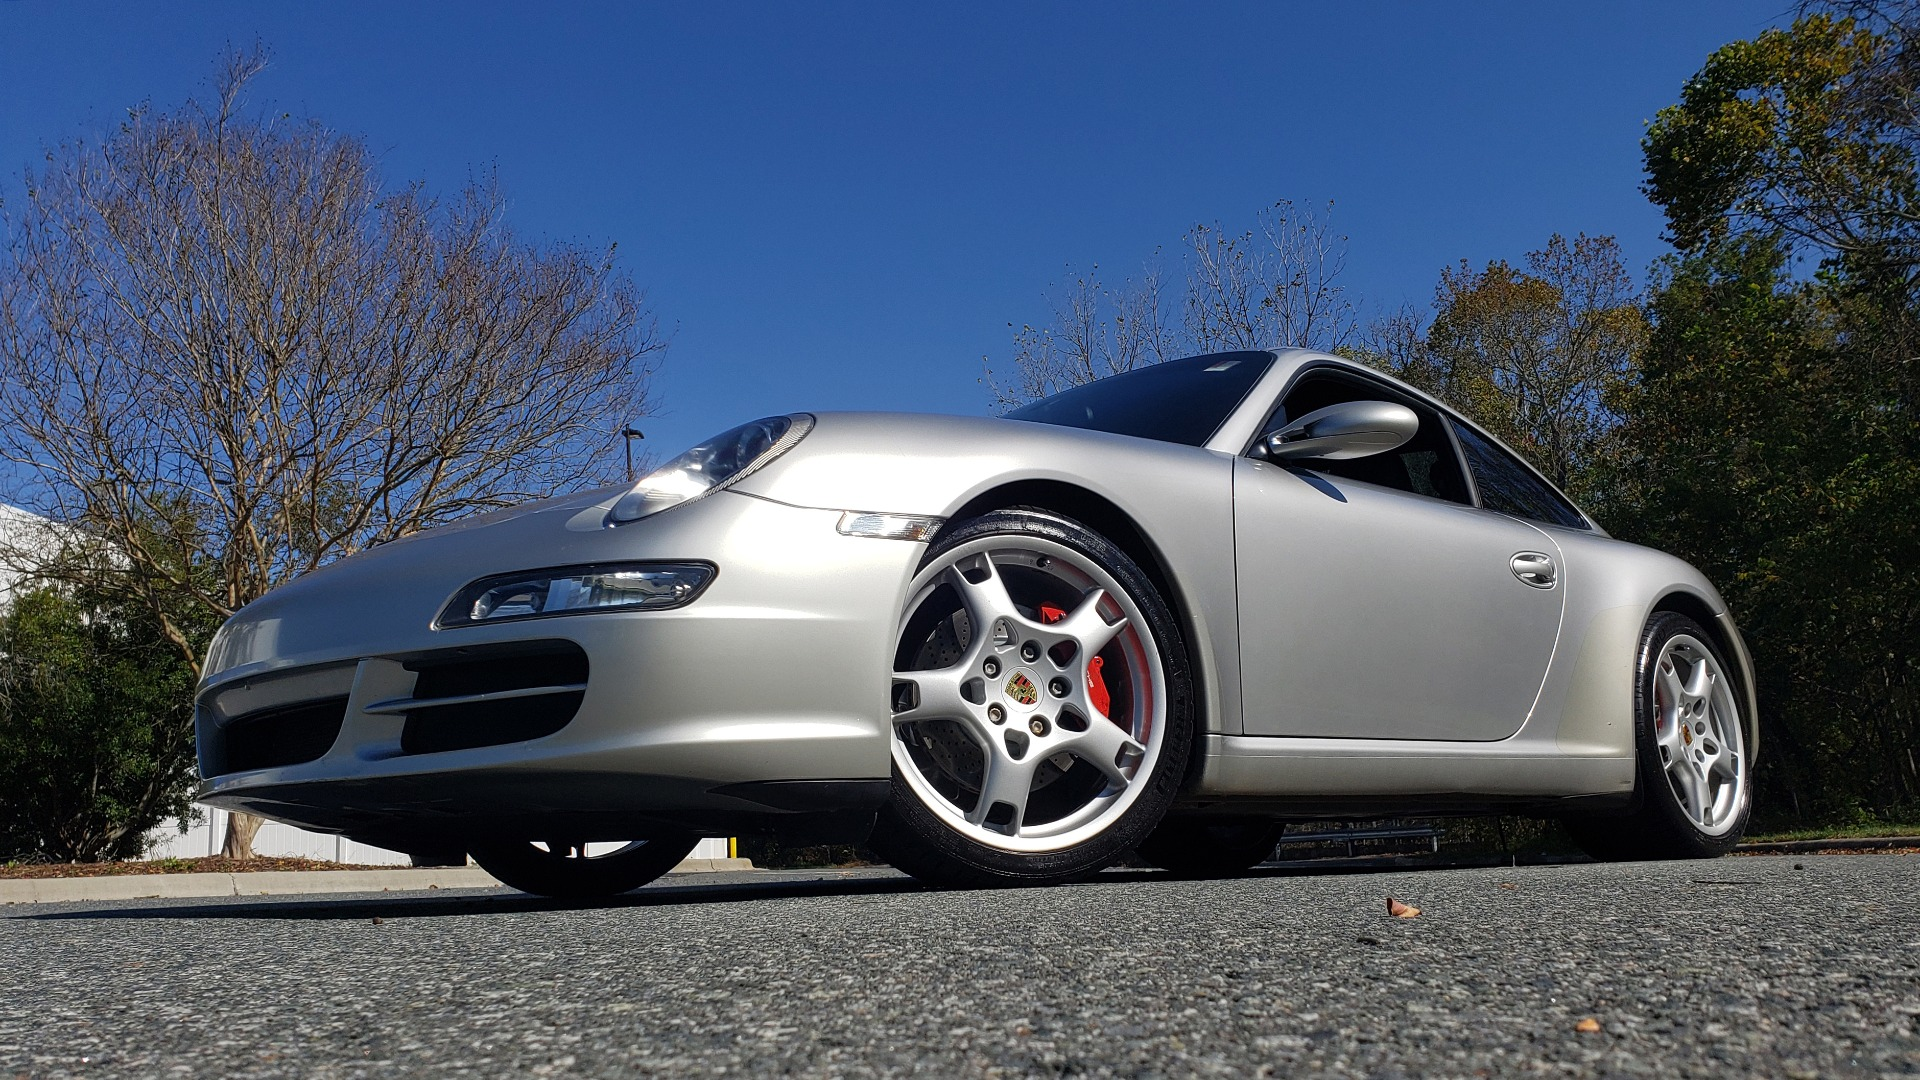 Used 2006 Porsche 911 CARRERA S / 5-SPD AUTO / SPORT CHRONO / NAV / BOSE / SUNROOF for sale Sold at Formula Imports in Charlotte NC 28227 3